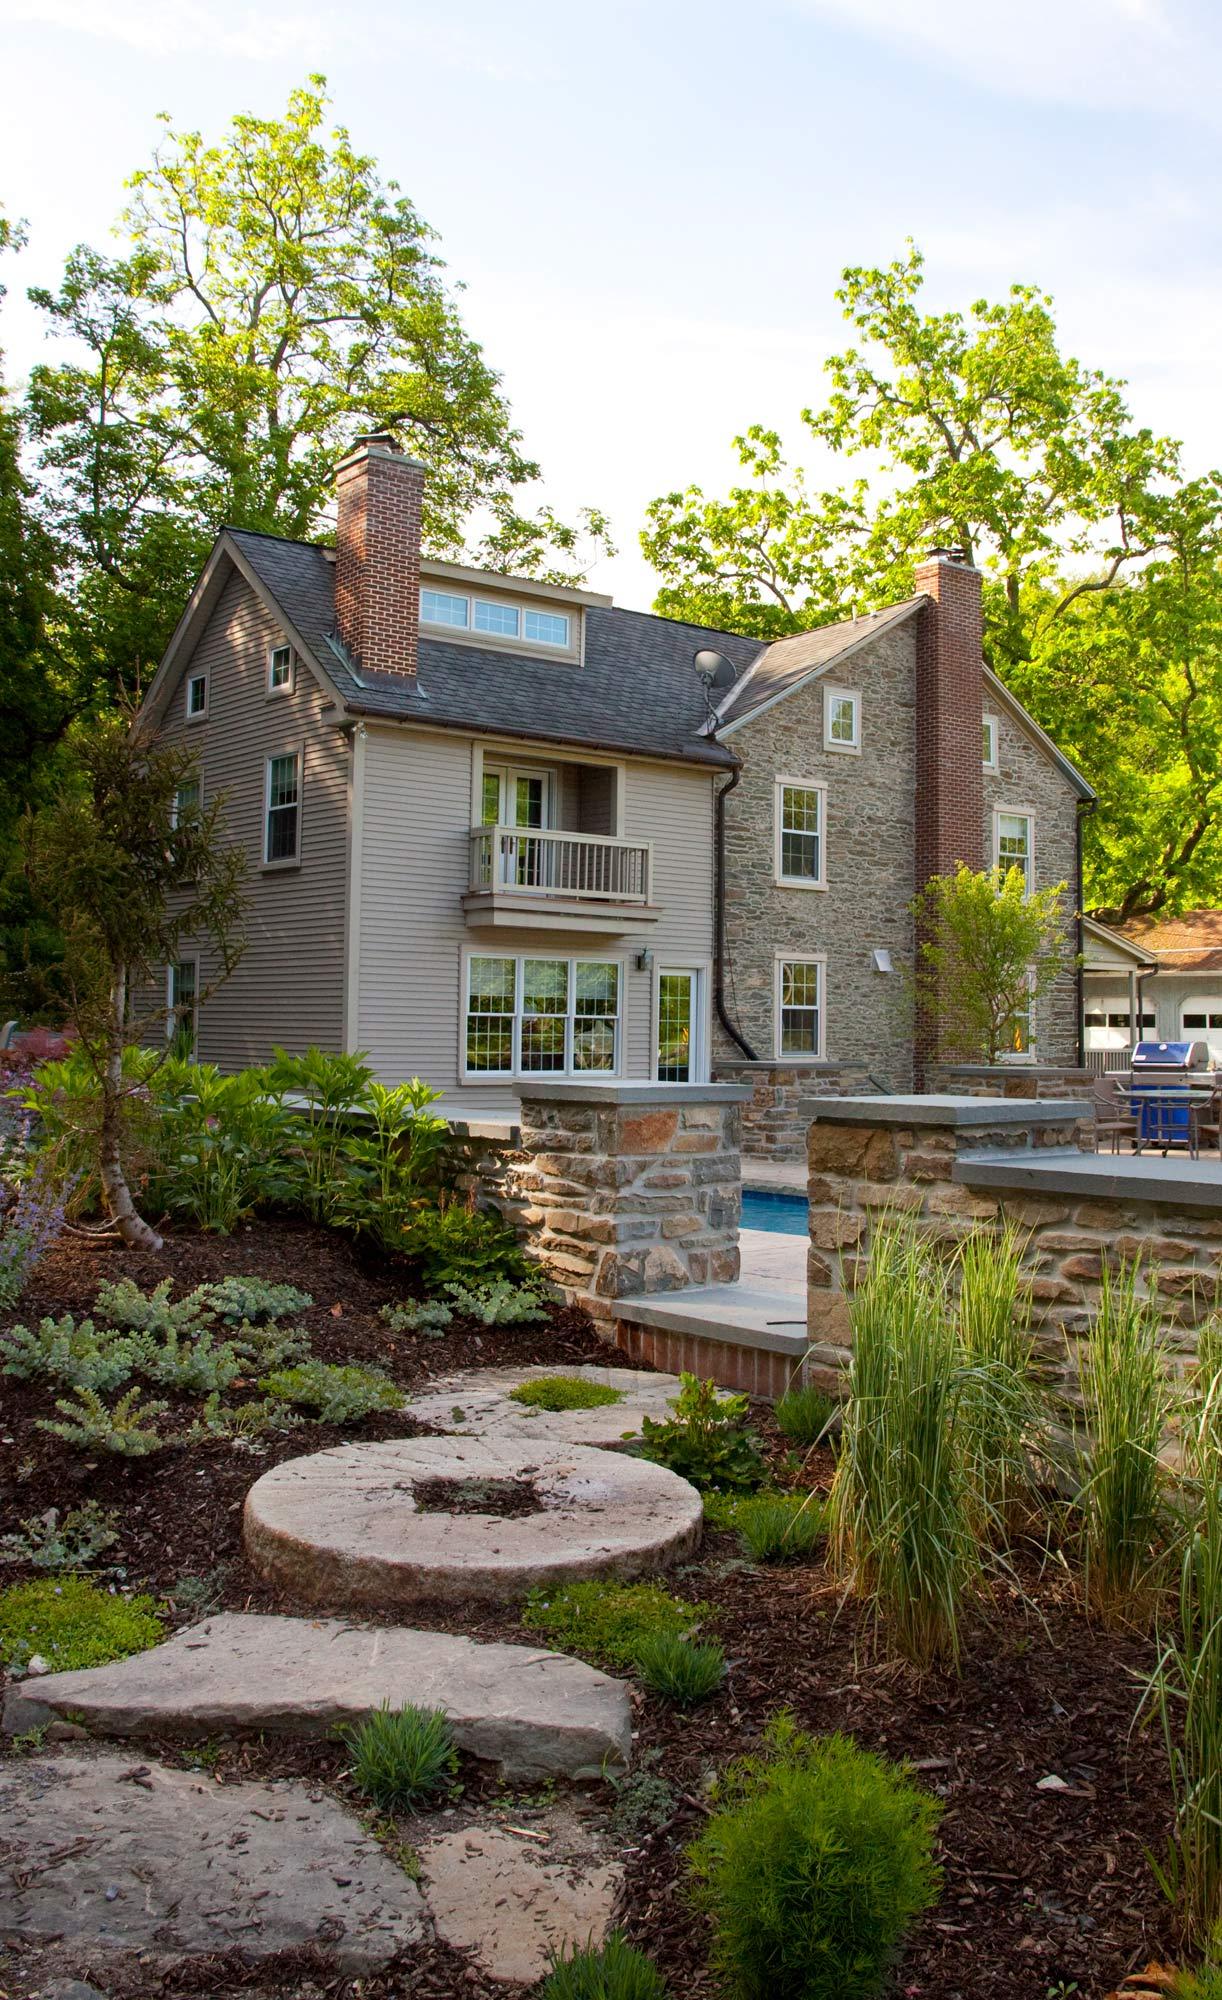 dietrich stonemasonry residential hardscape